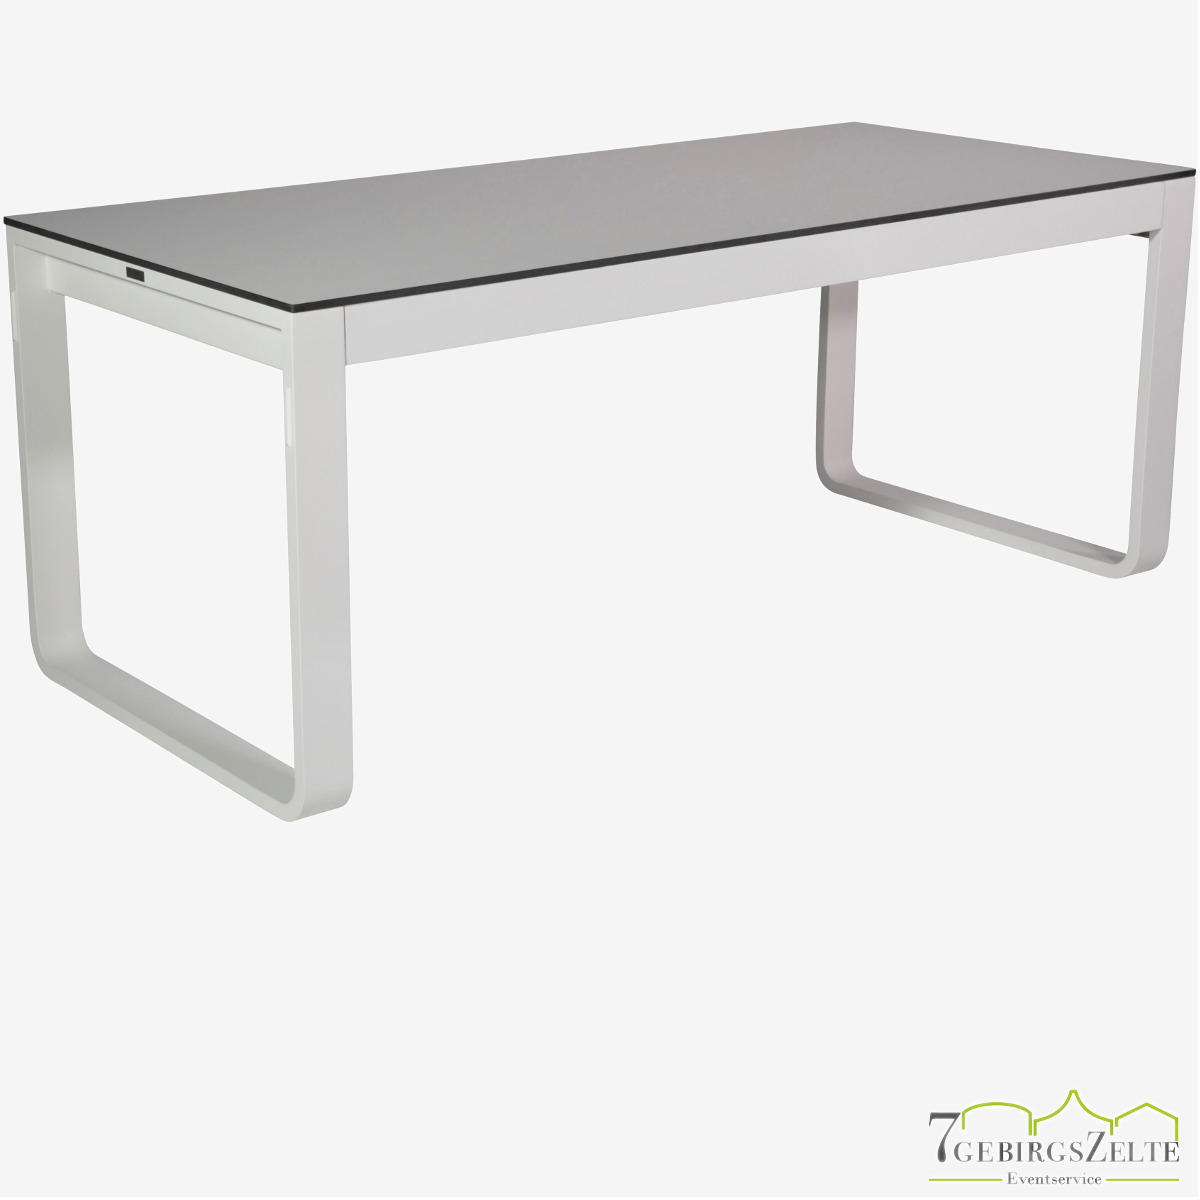 Flow Dinner 180x80x74cm alu weiß - top compact weiß